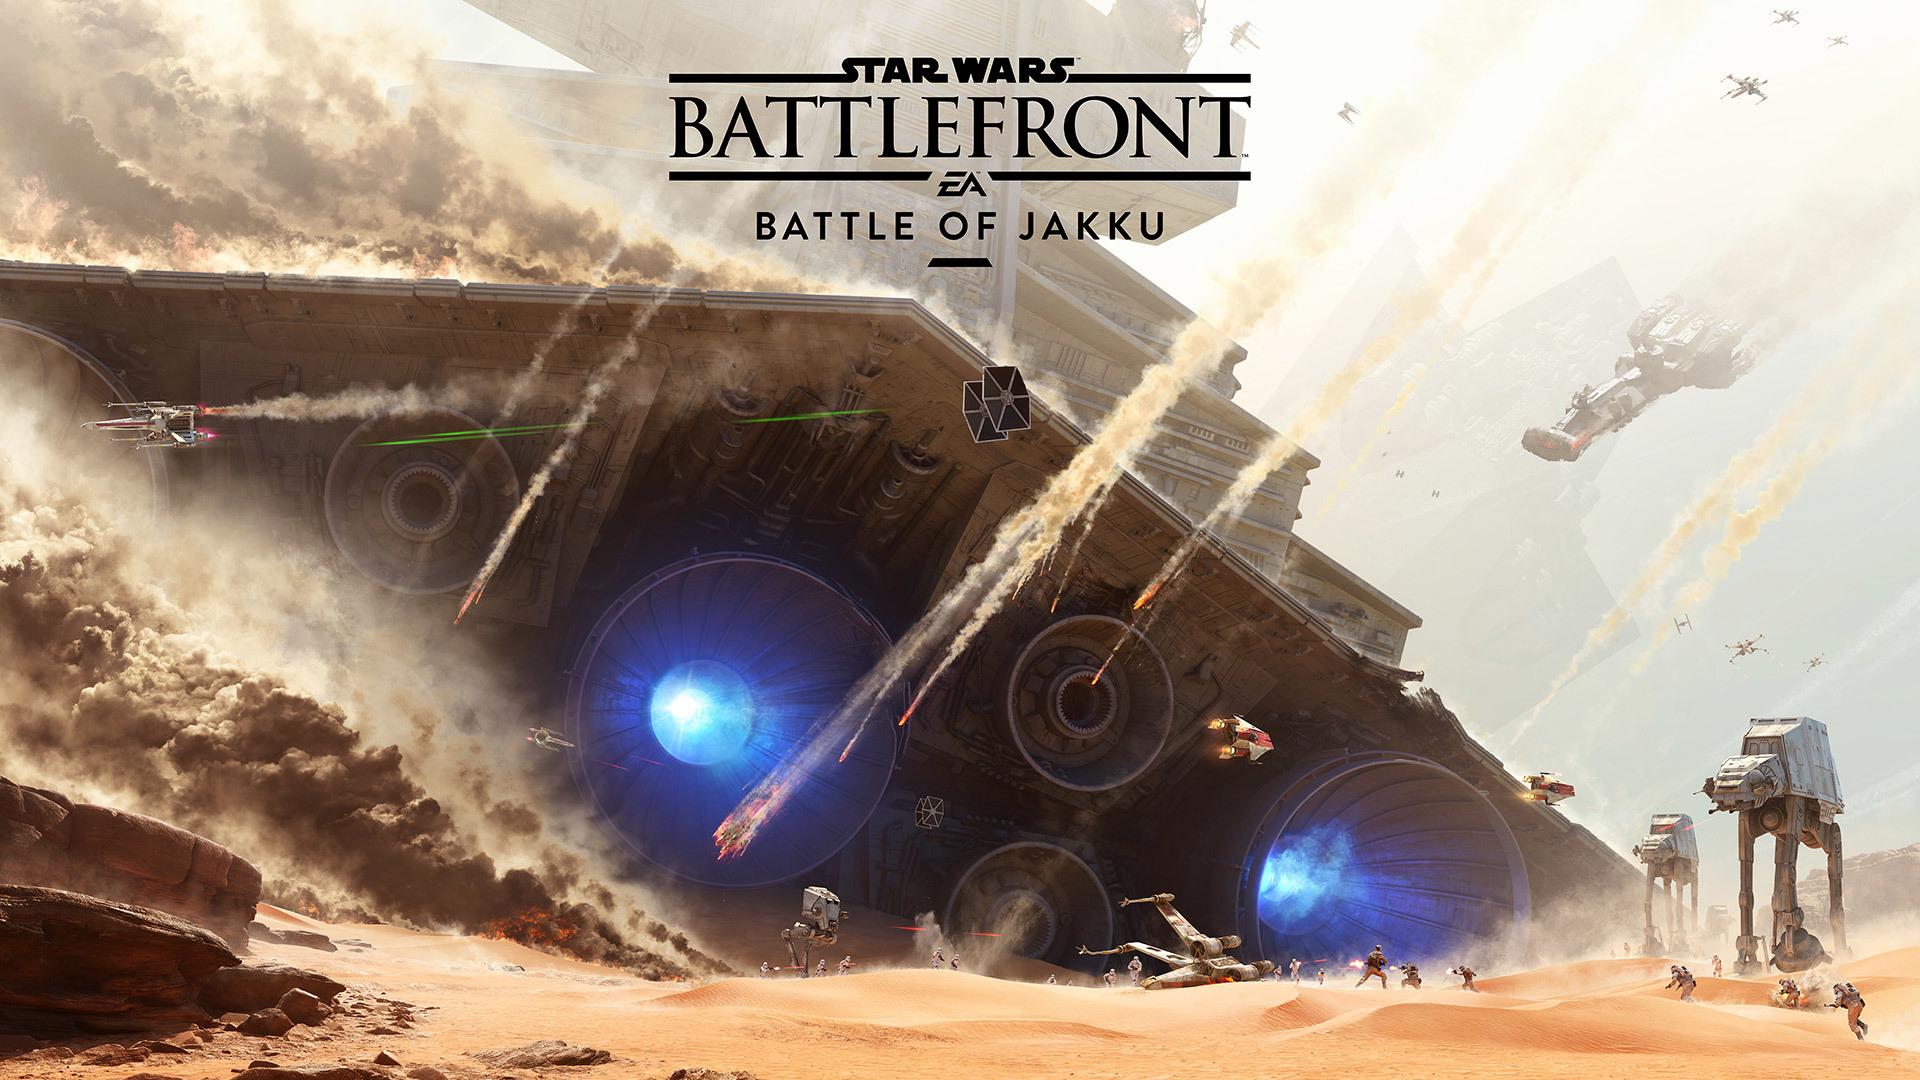 49 Star Wars Battlefront Desktop Wallpapers On Wallpapersafari